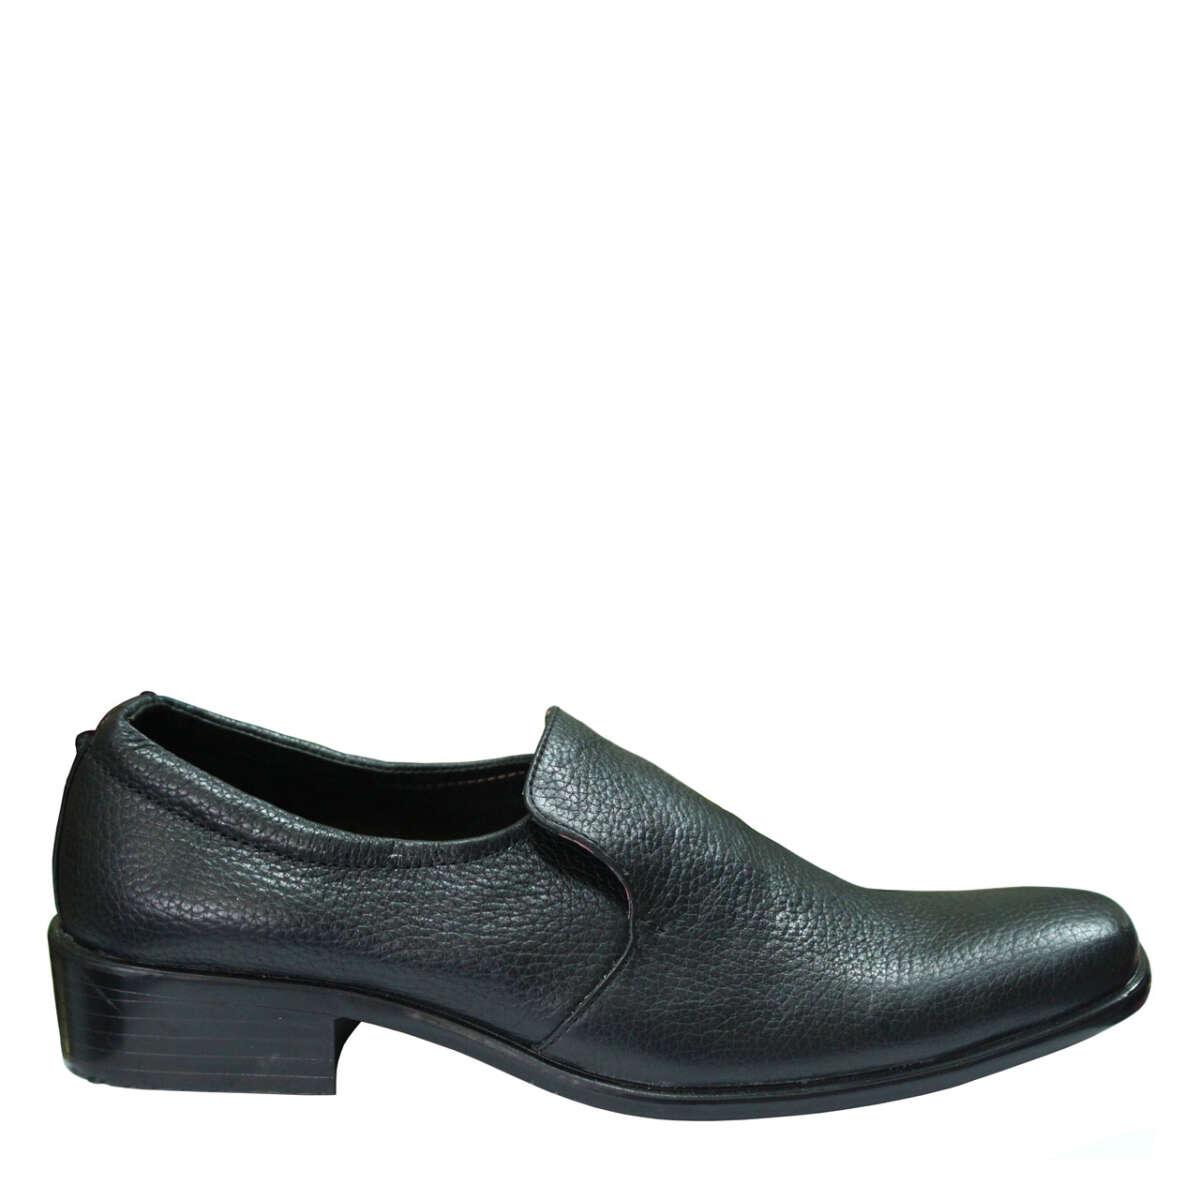 Giày nam da bò B852a